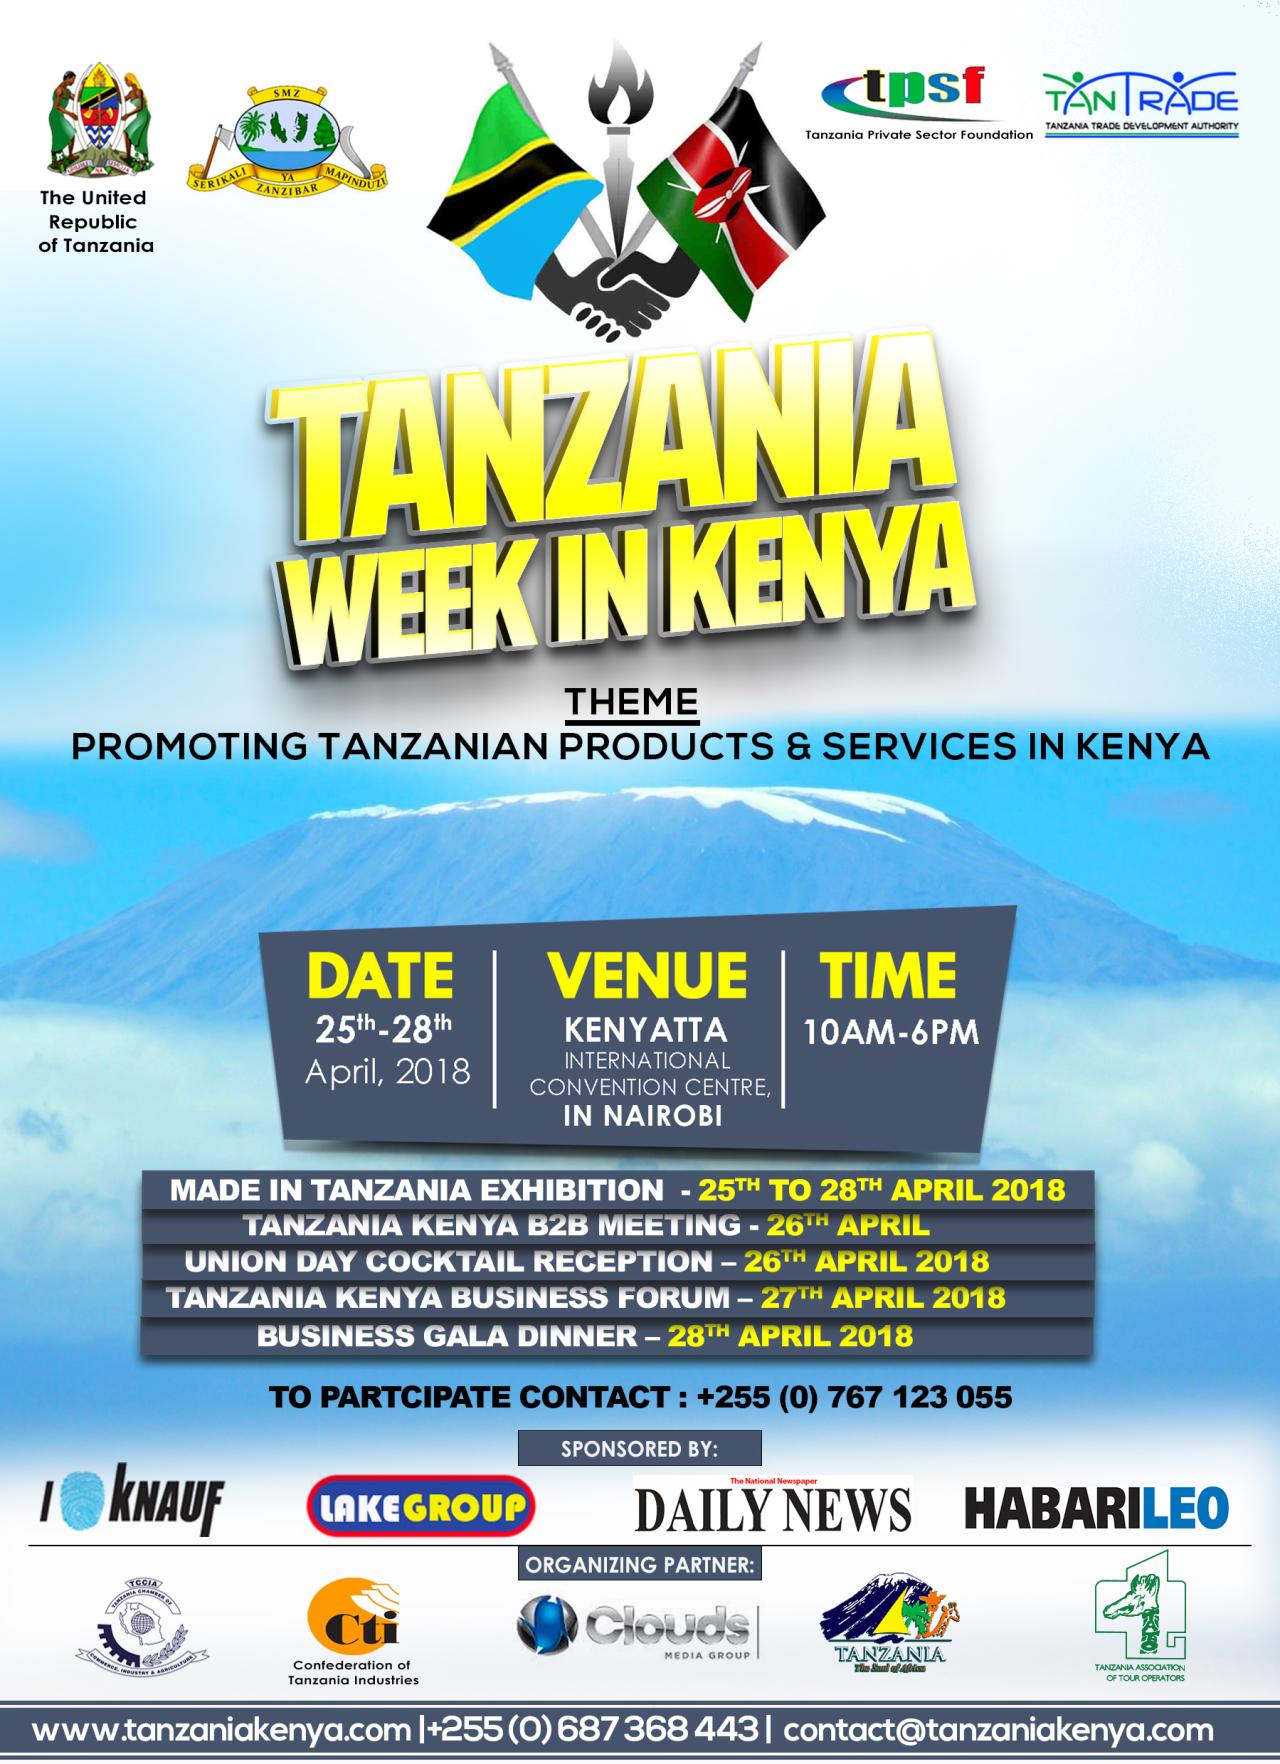 Made in Tanzania Week in Kenya